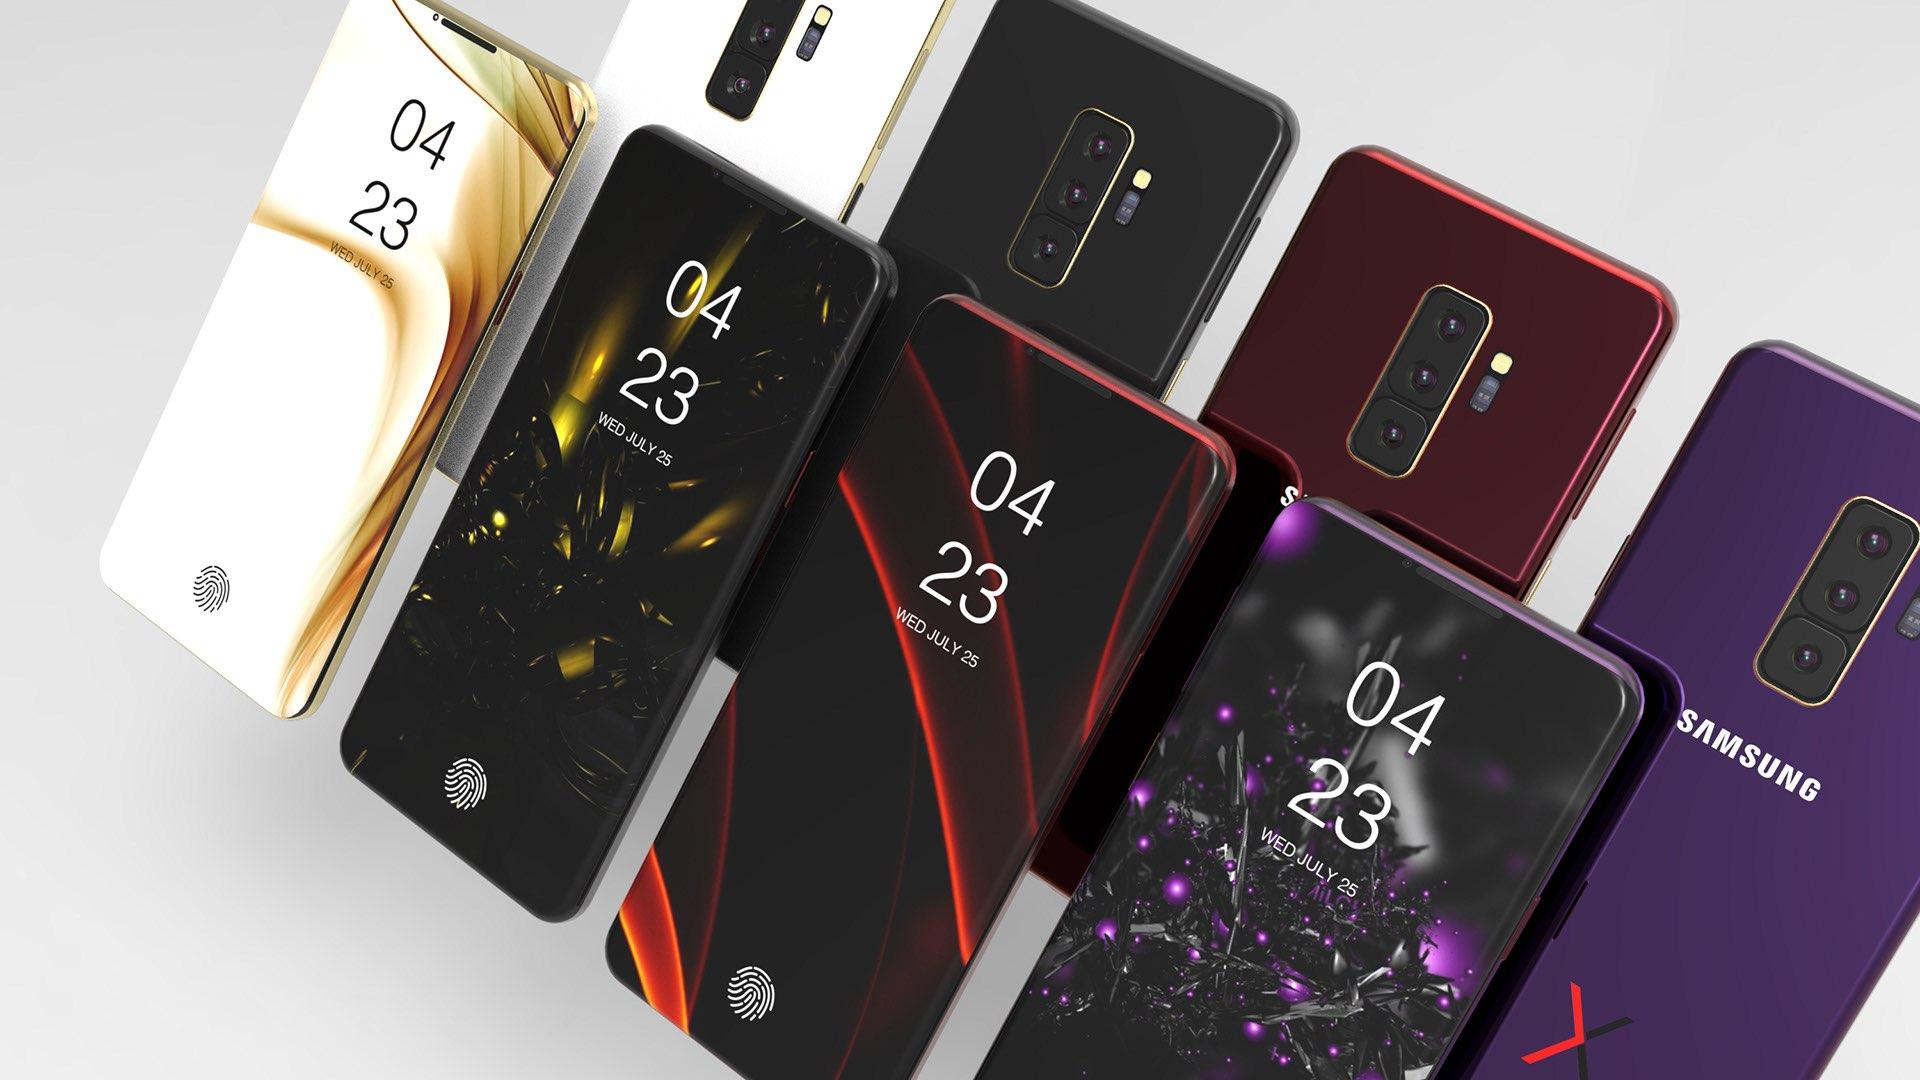 Galaxy S10 rumors: 3 models, 5 cameras, in-display fingerprint